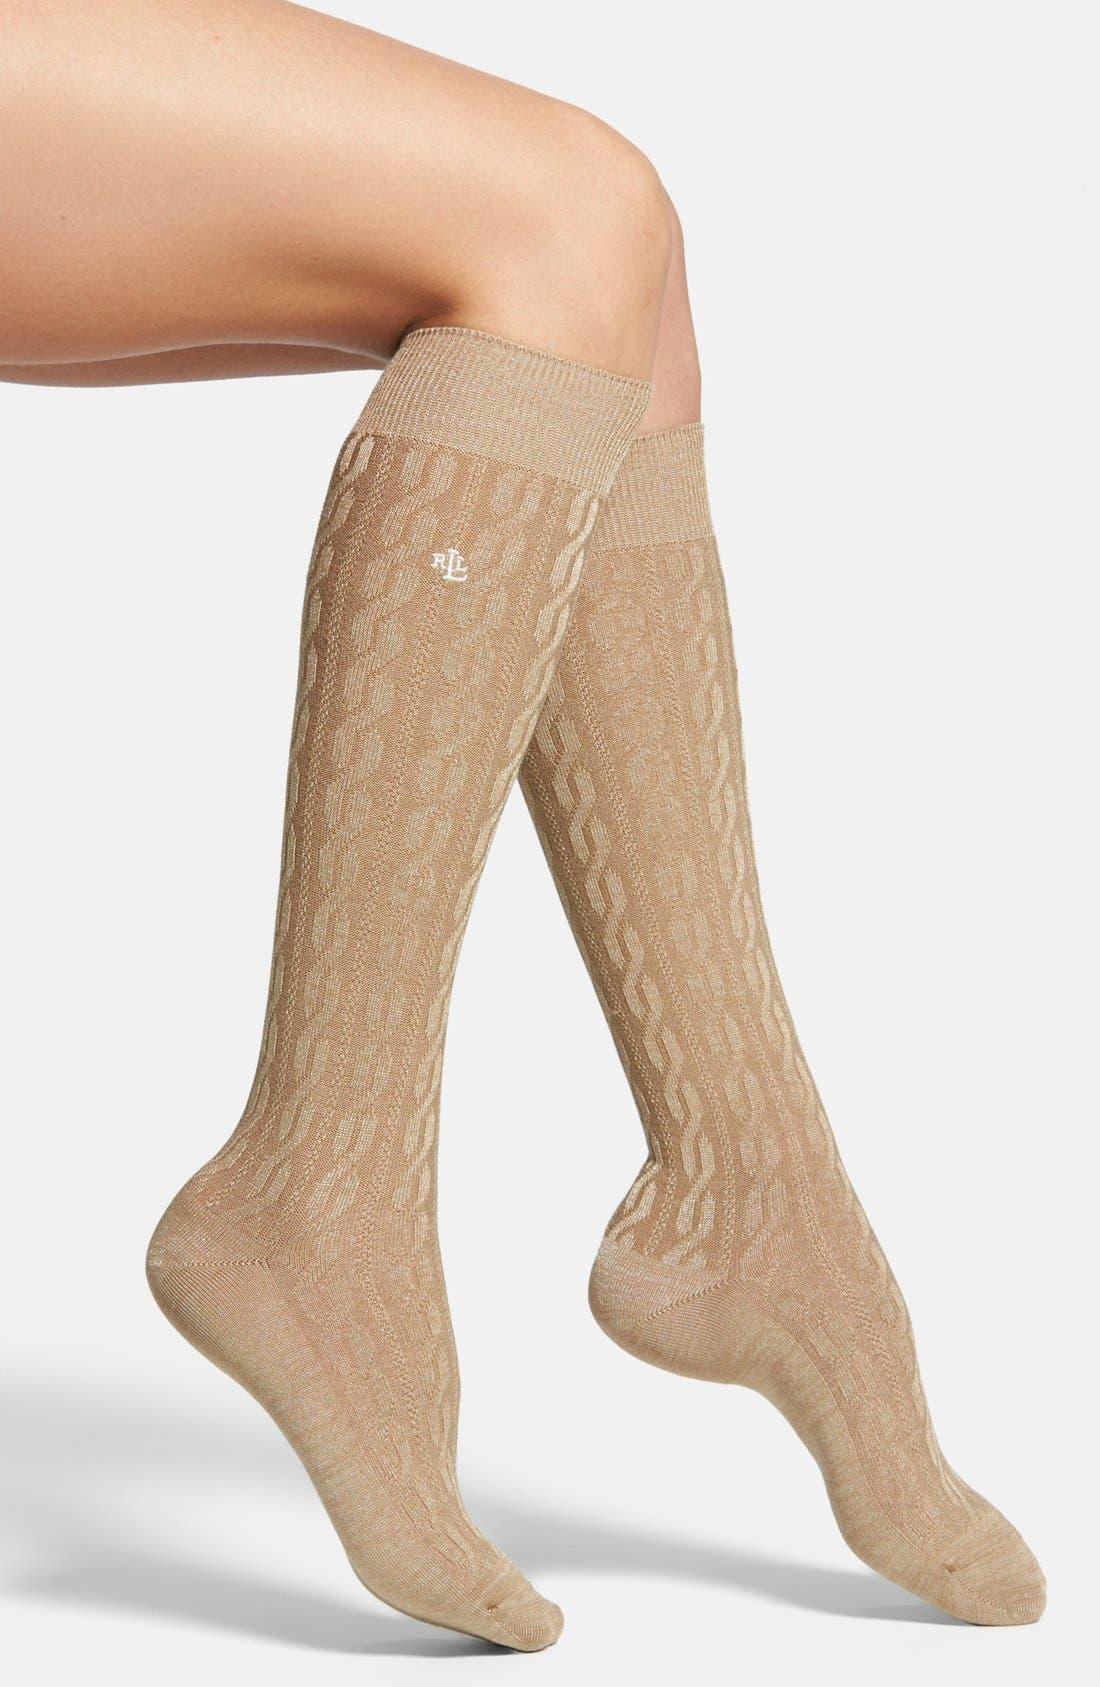 Alternate Image 1 Selected - Ralph Lauren Cable Knit Knee High Socks